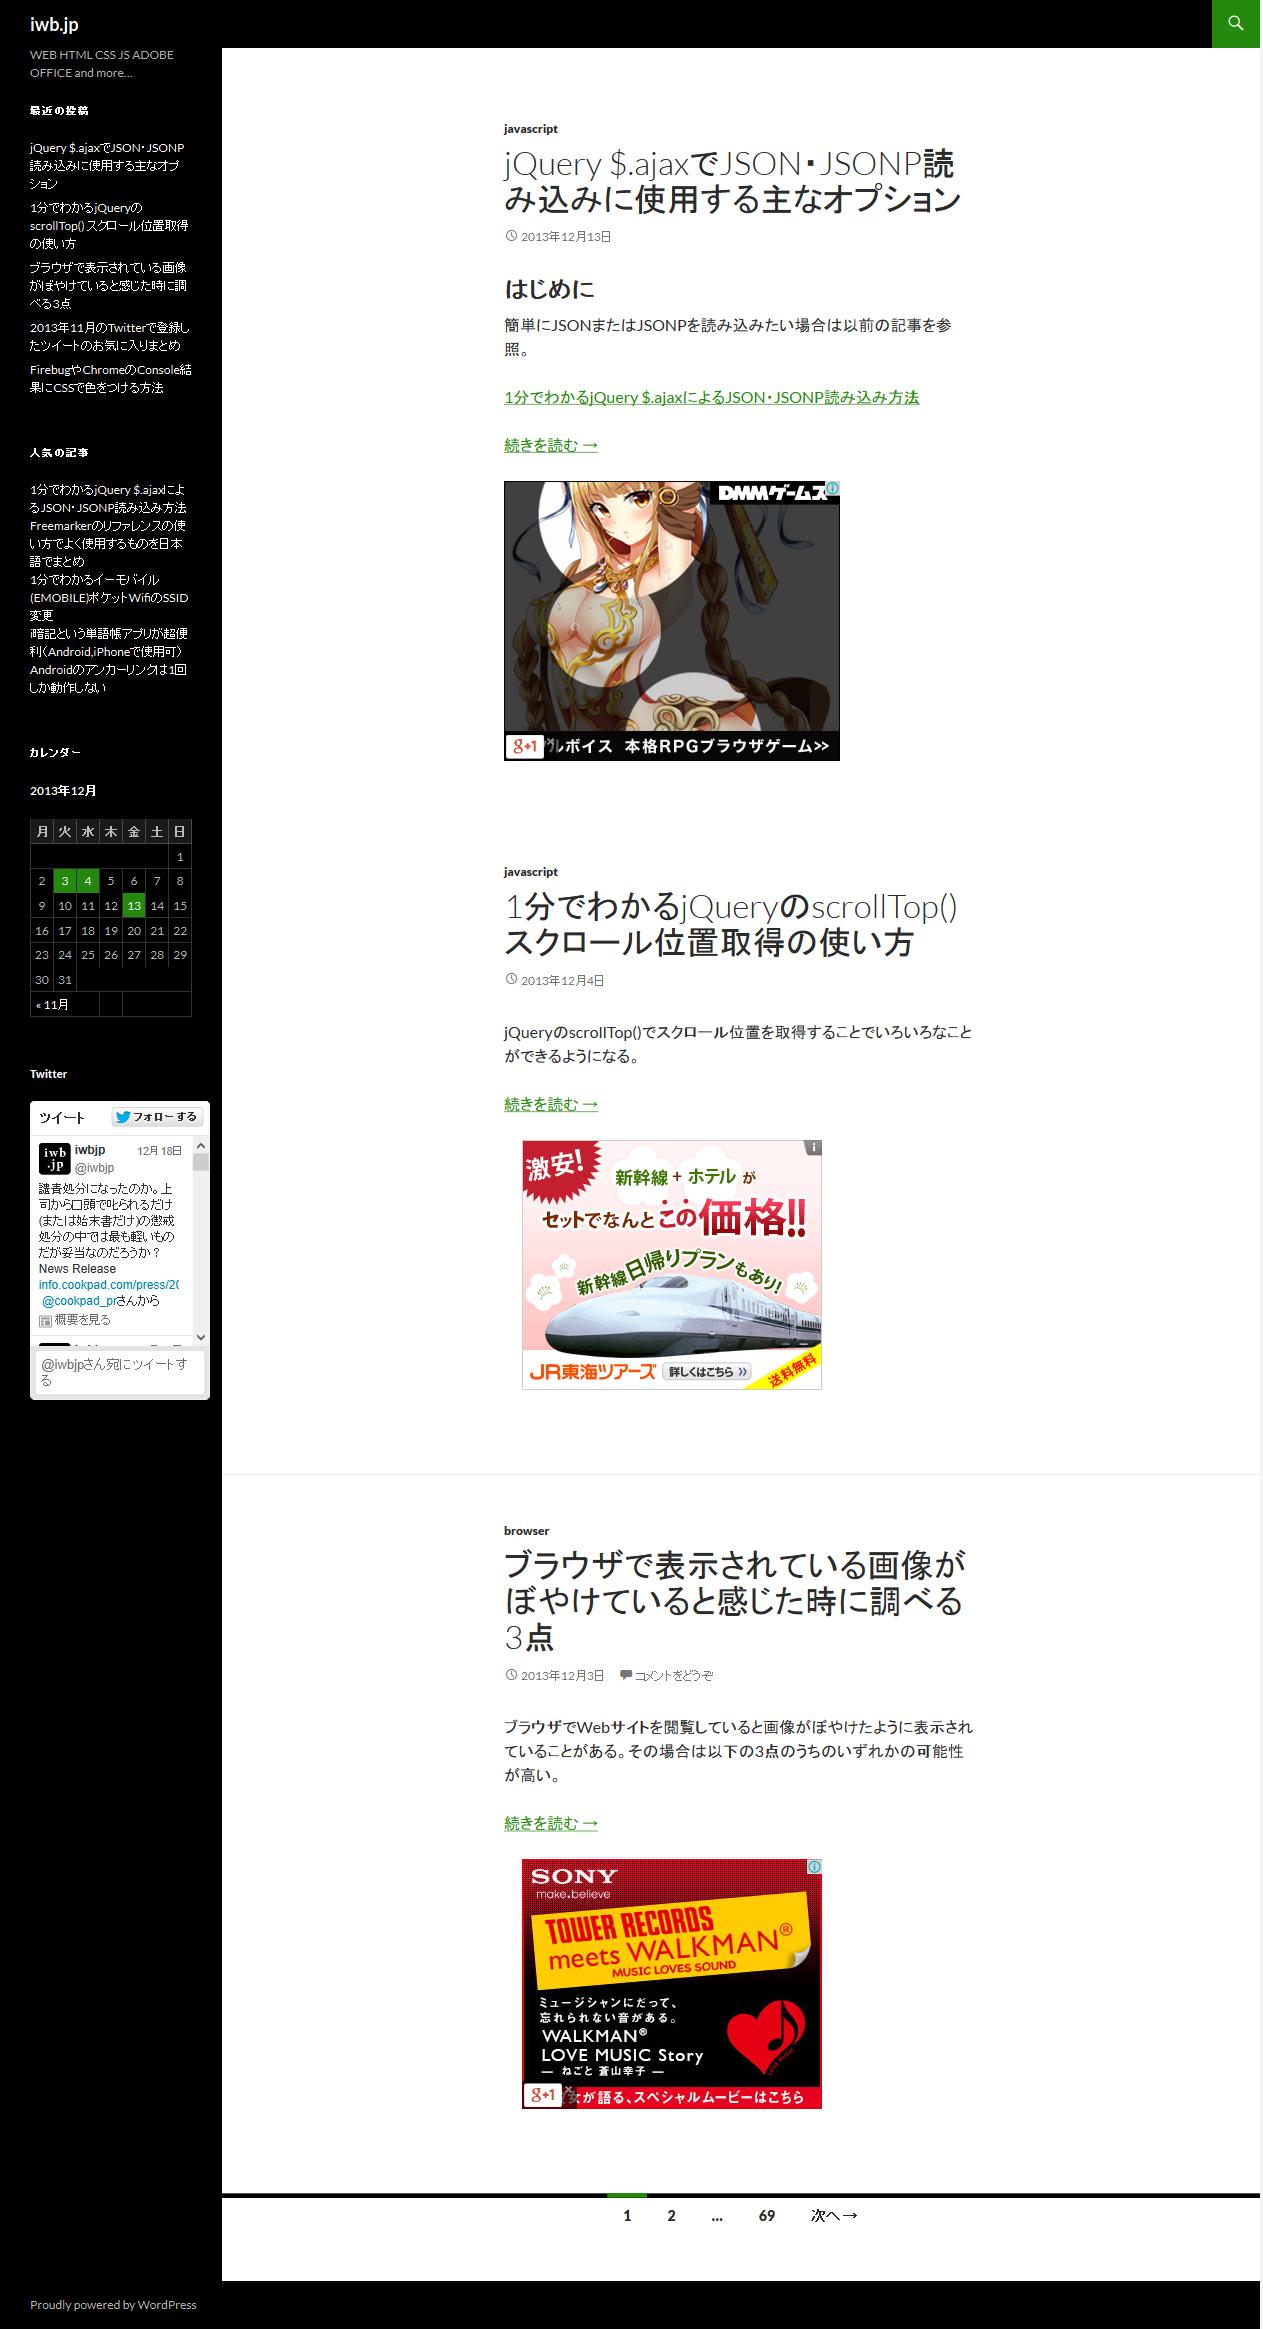 WordPress 3.8 iwb.jp画面キャプチャ